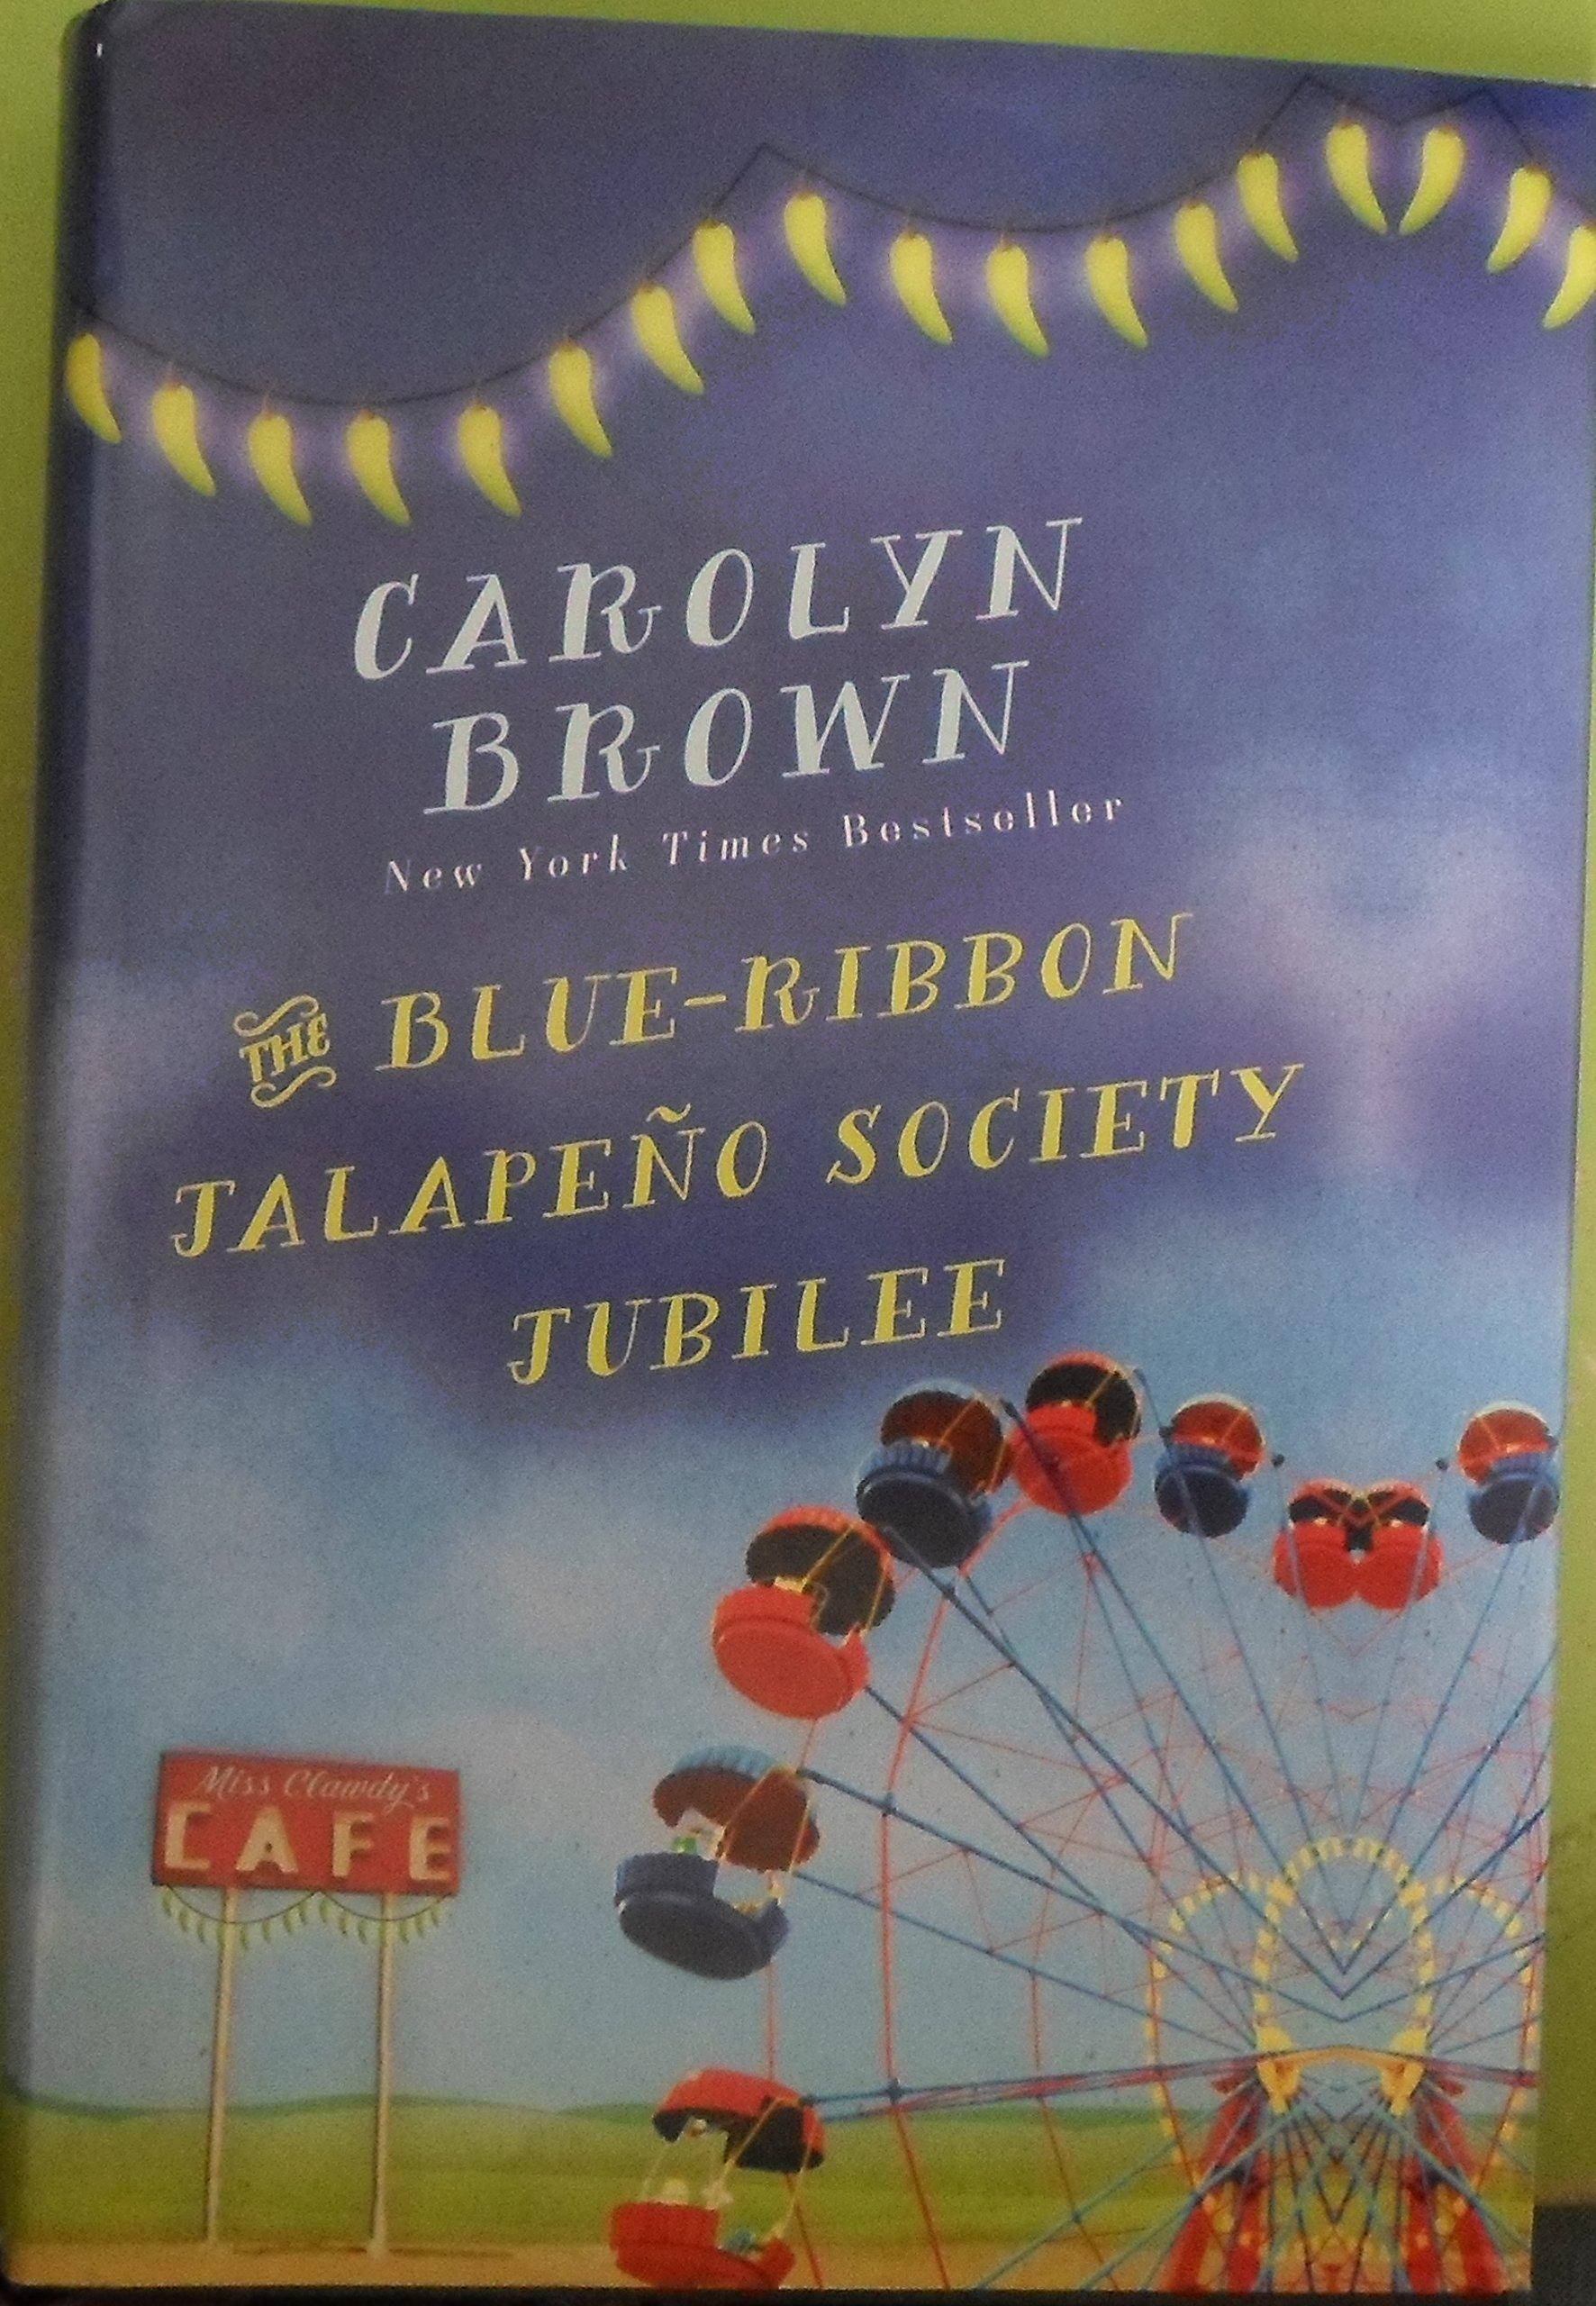 Blue Ribbon Jalape%C3%B1o Society Jubilee